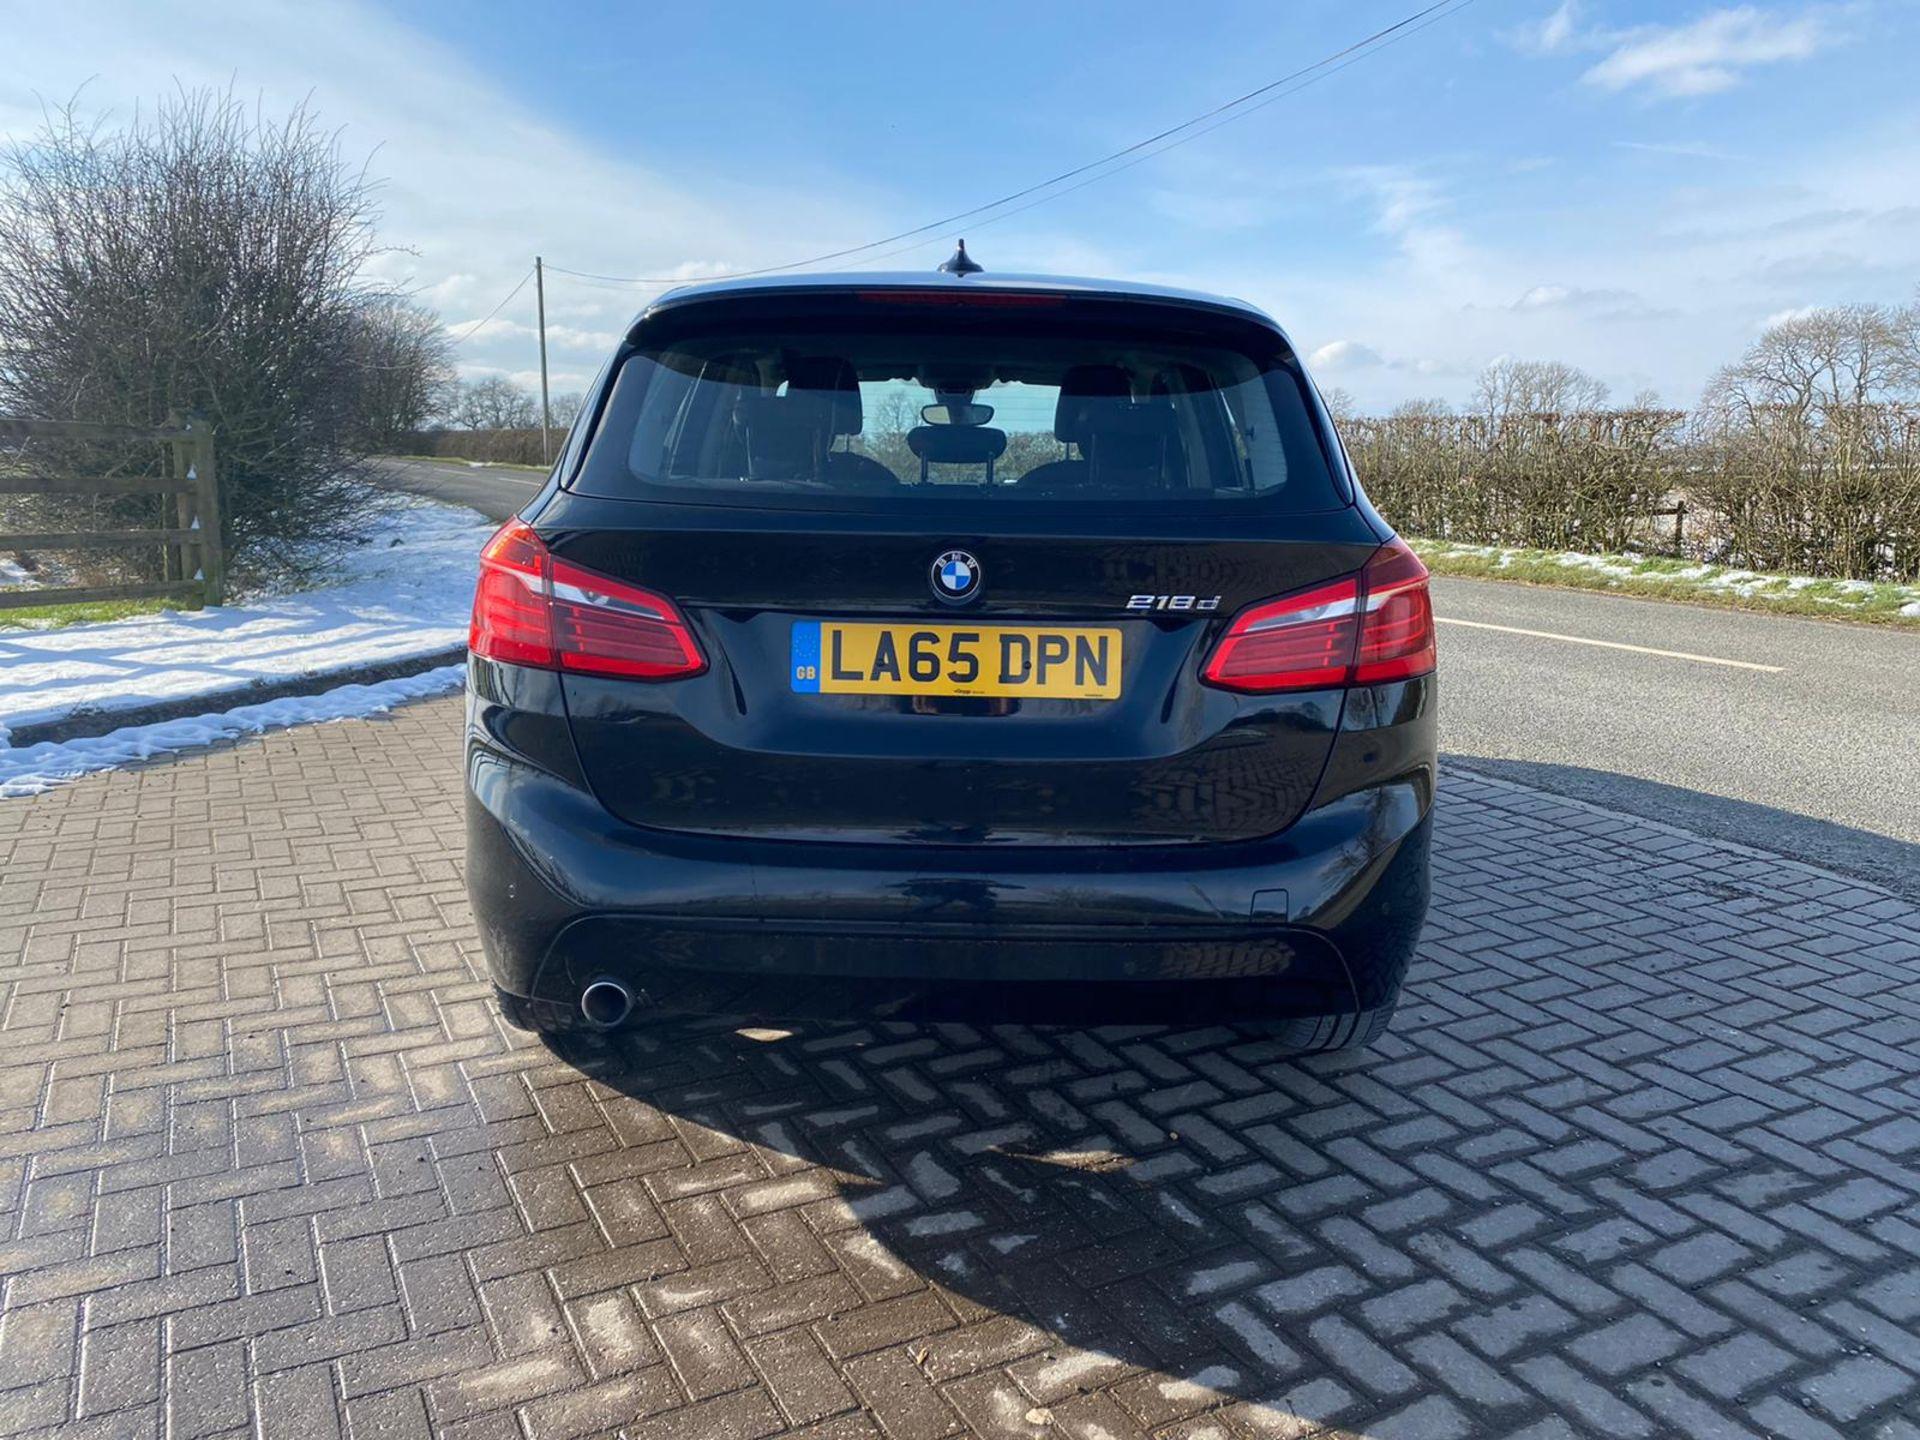 "ON SALE BMW 218d ""SPORT"" MPV 2.0 DIESEL ""EURO 6"" (2016 REG) - 1 OWNER - GREAT SPEC - BLACK - LOOK!! - Image 3 of 16"